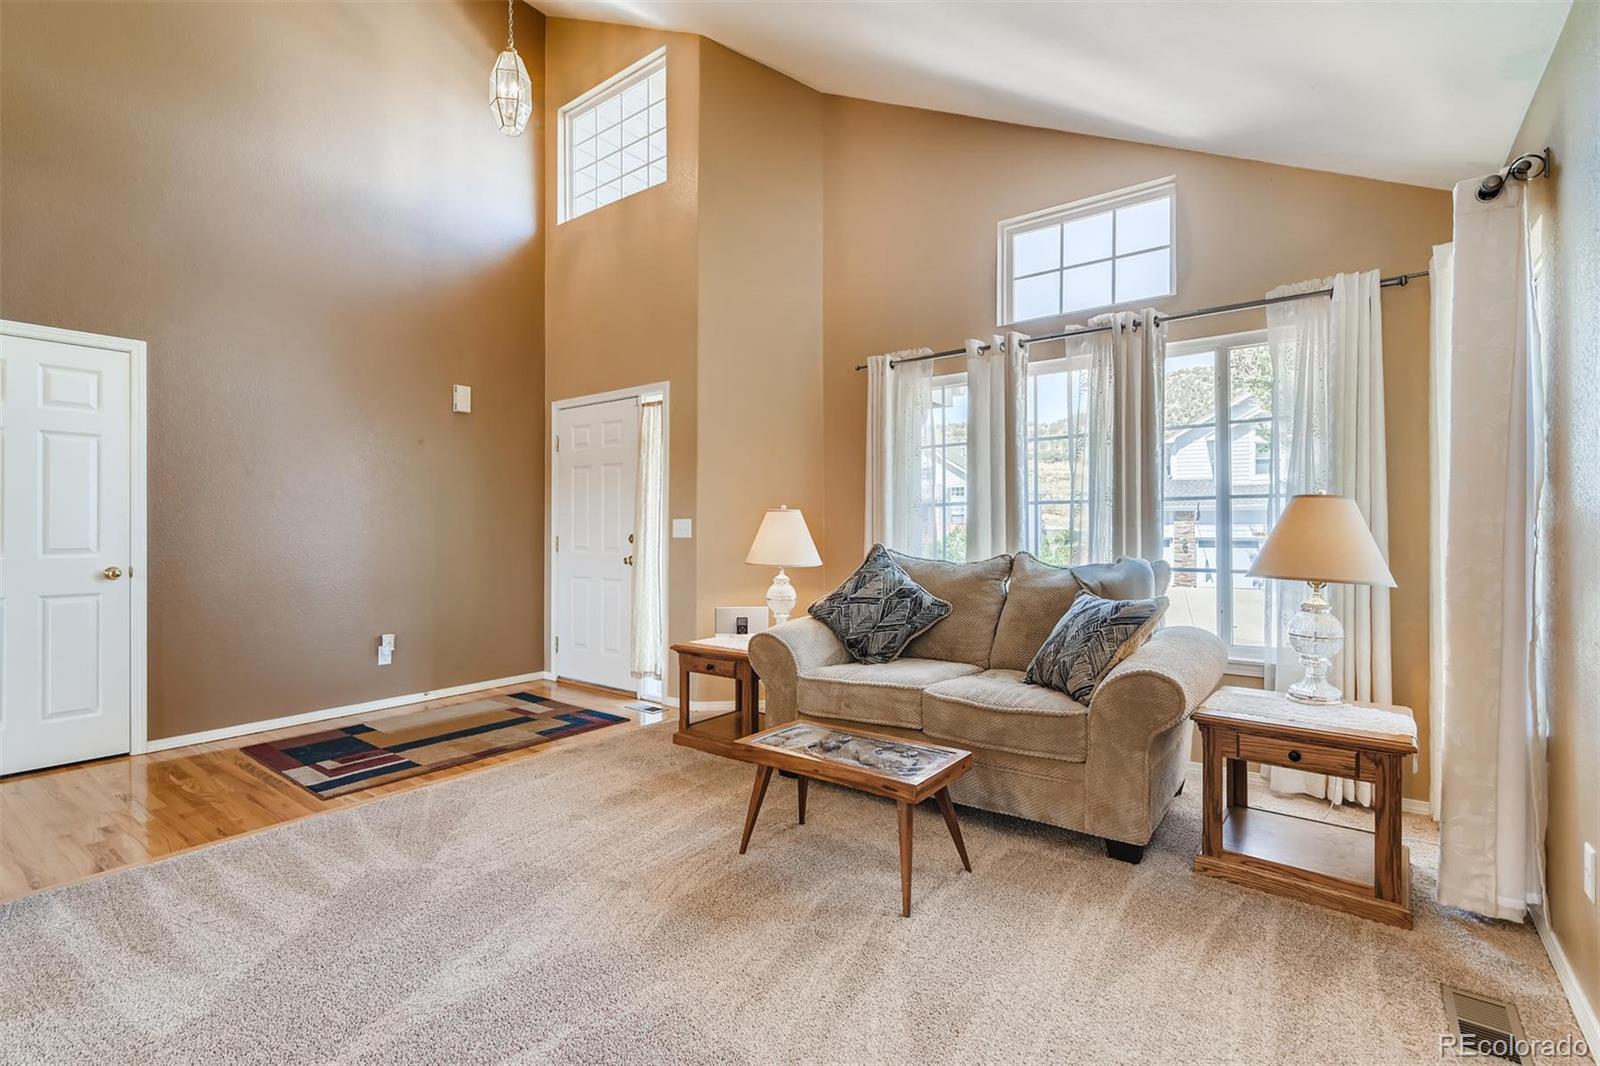 MLS# 9724731 - 6 - 498 Promontory Drive, Loveland, CO 80537